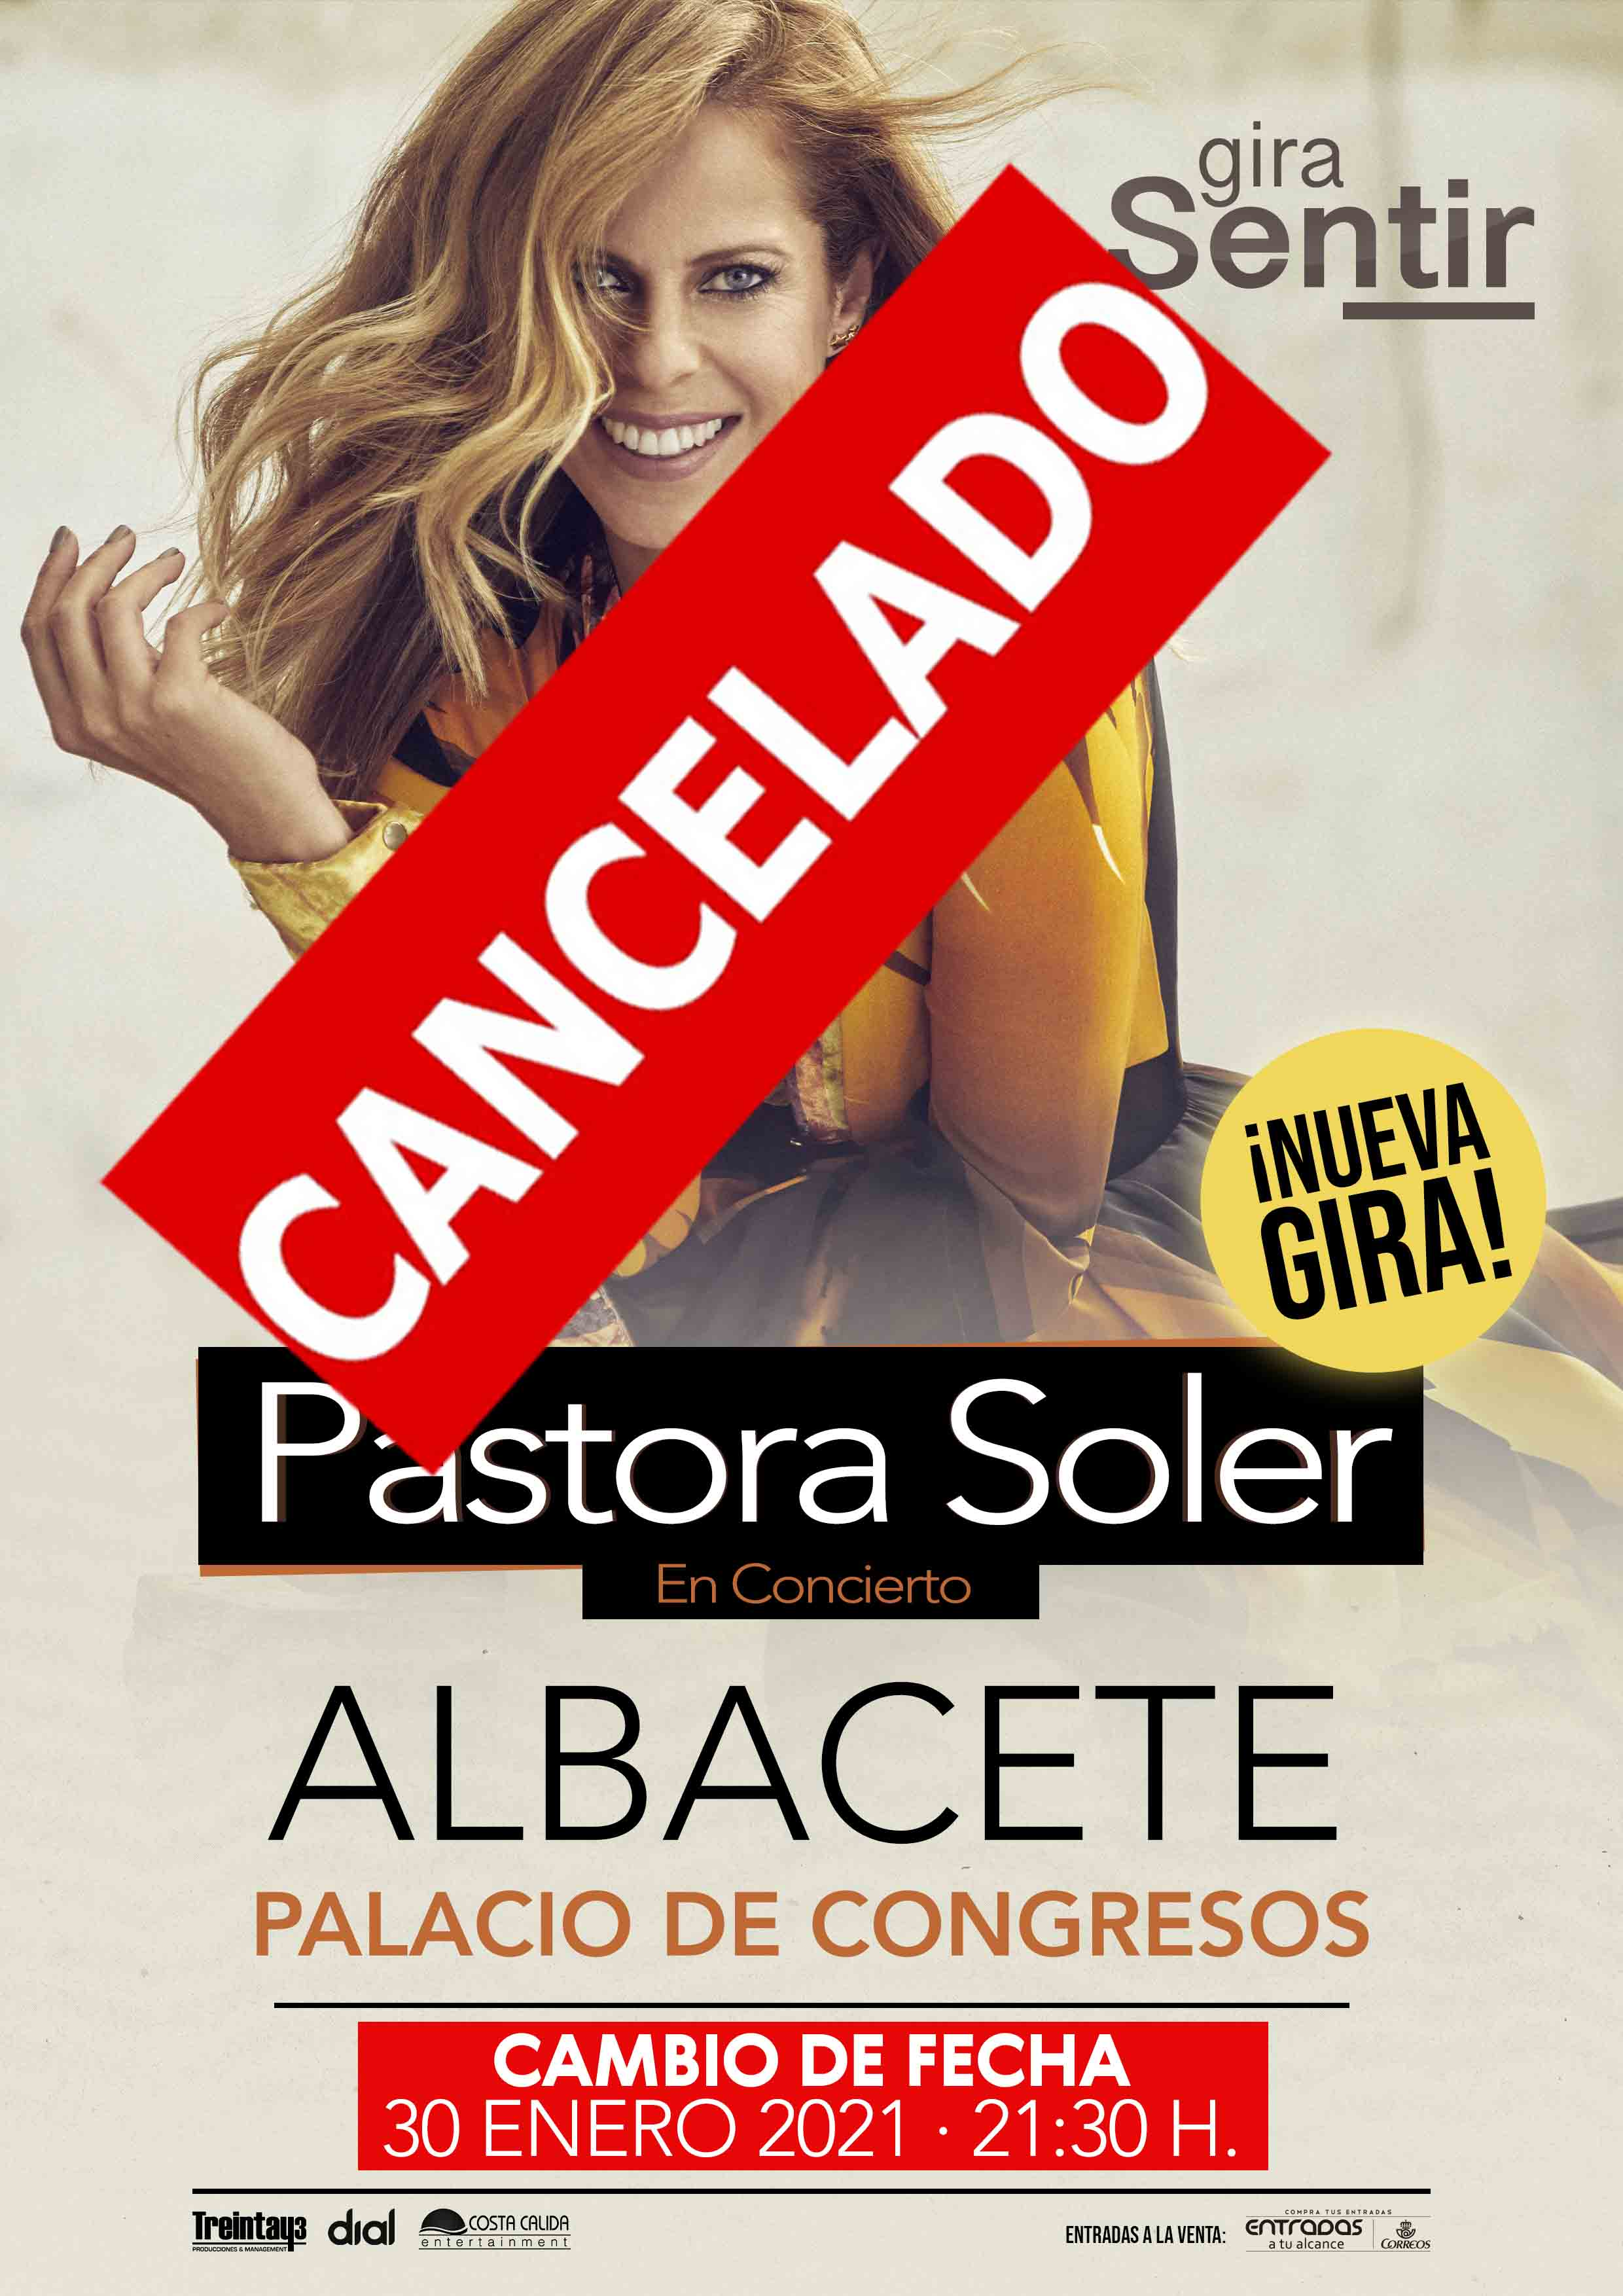 pastora-soler-albacete-5fae48fbb78be.jpeg